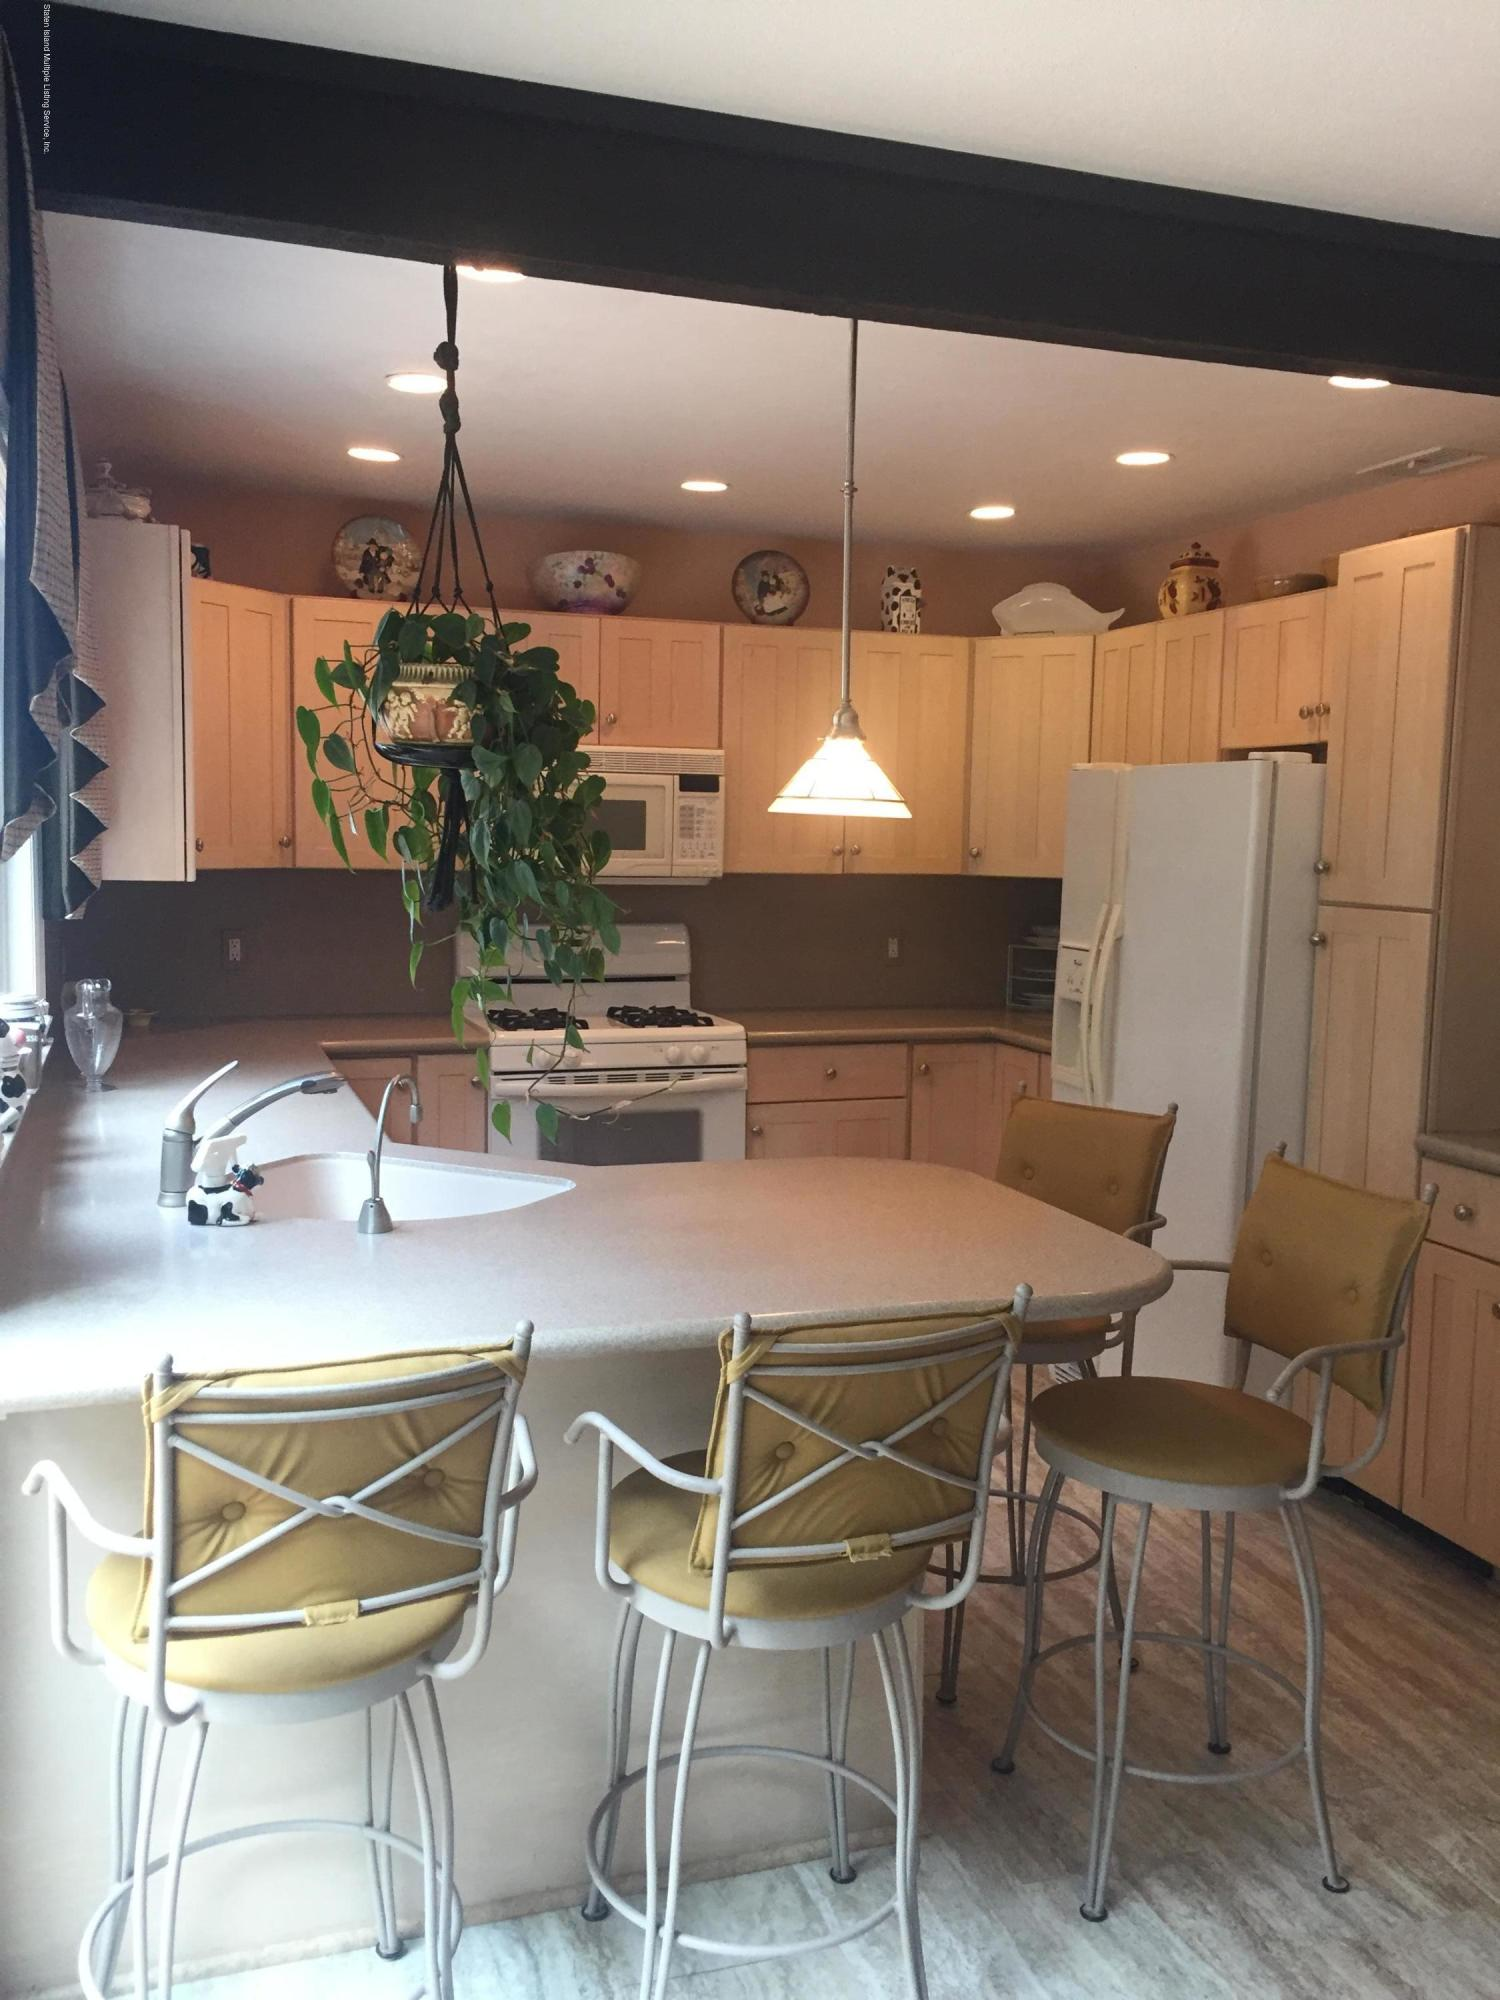 Single Family - Detached 46 Forrestal Avenue  Staten Island, NY 10312, MLS-1131922-17